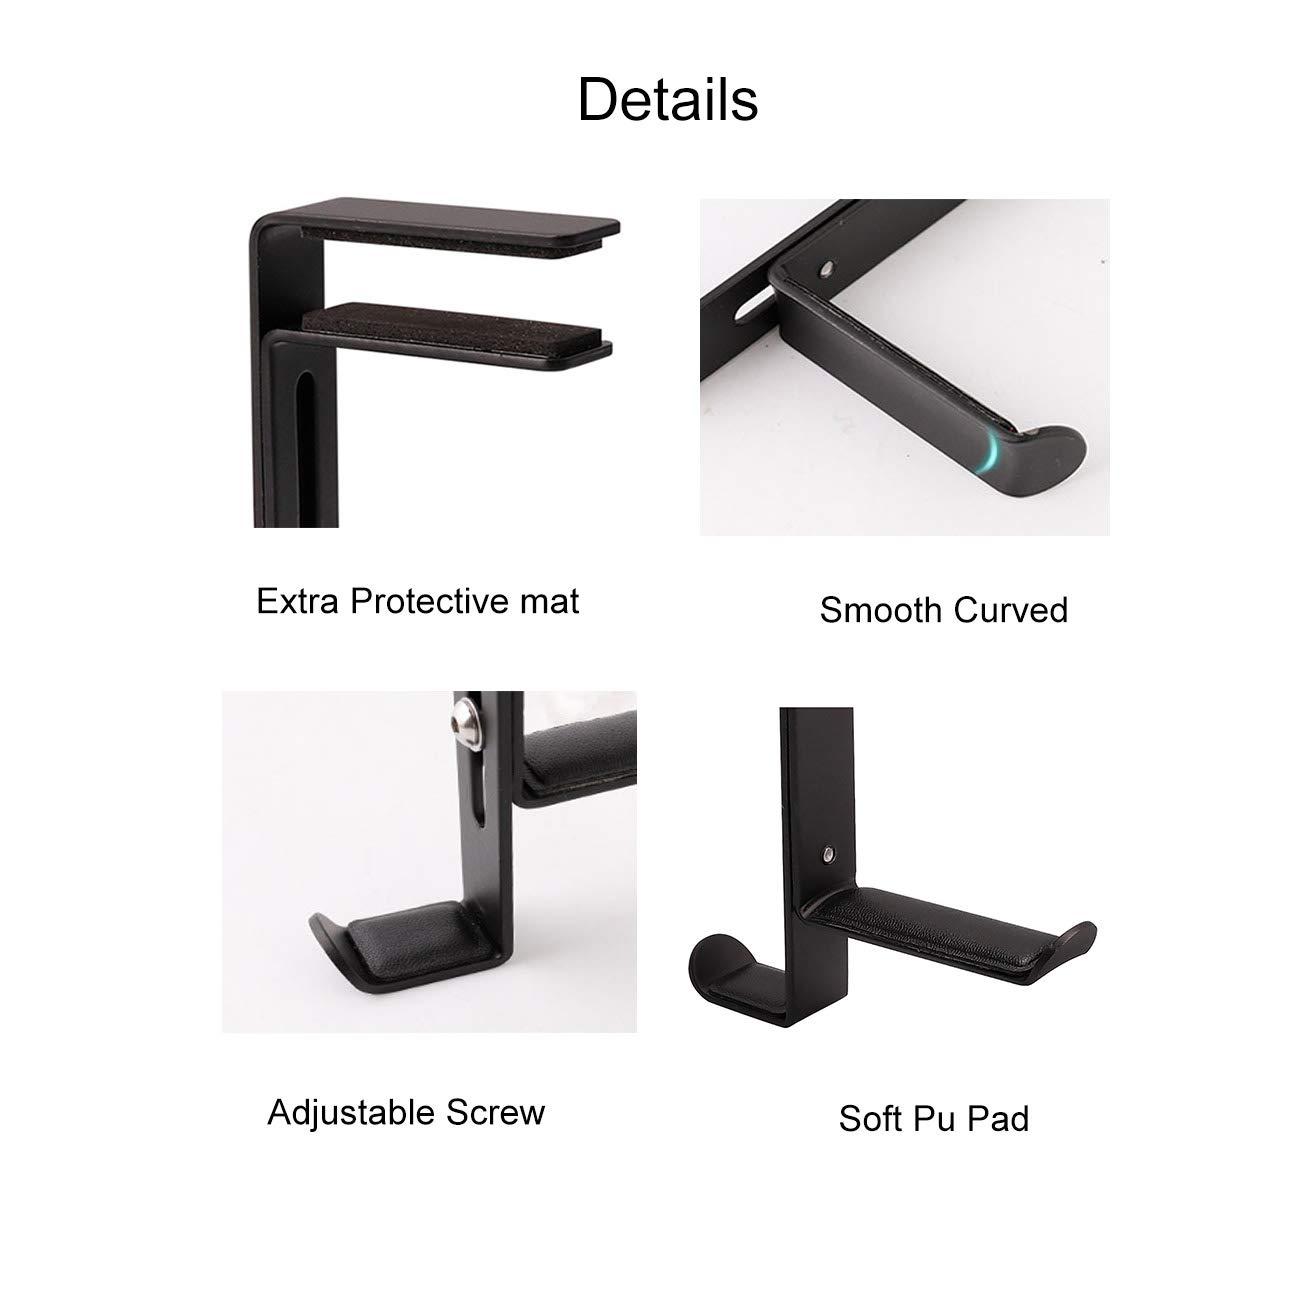 White Oriolus Headphone Hanger Headset Hook Holder with Adjustable Clamp for Desk